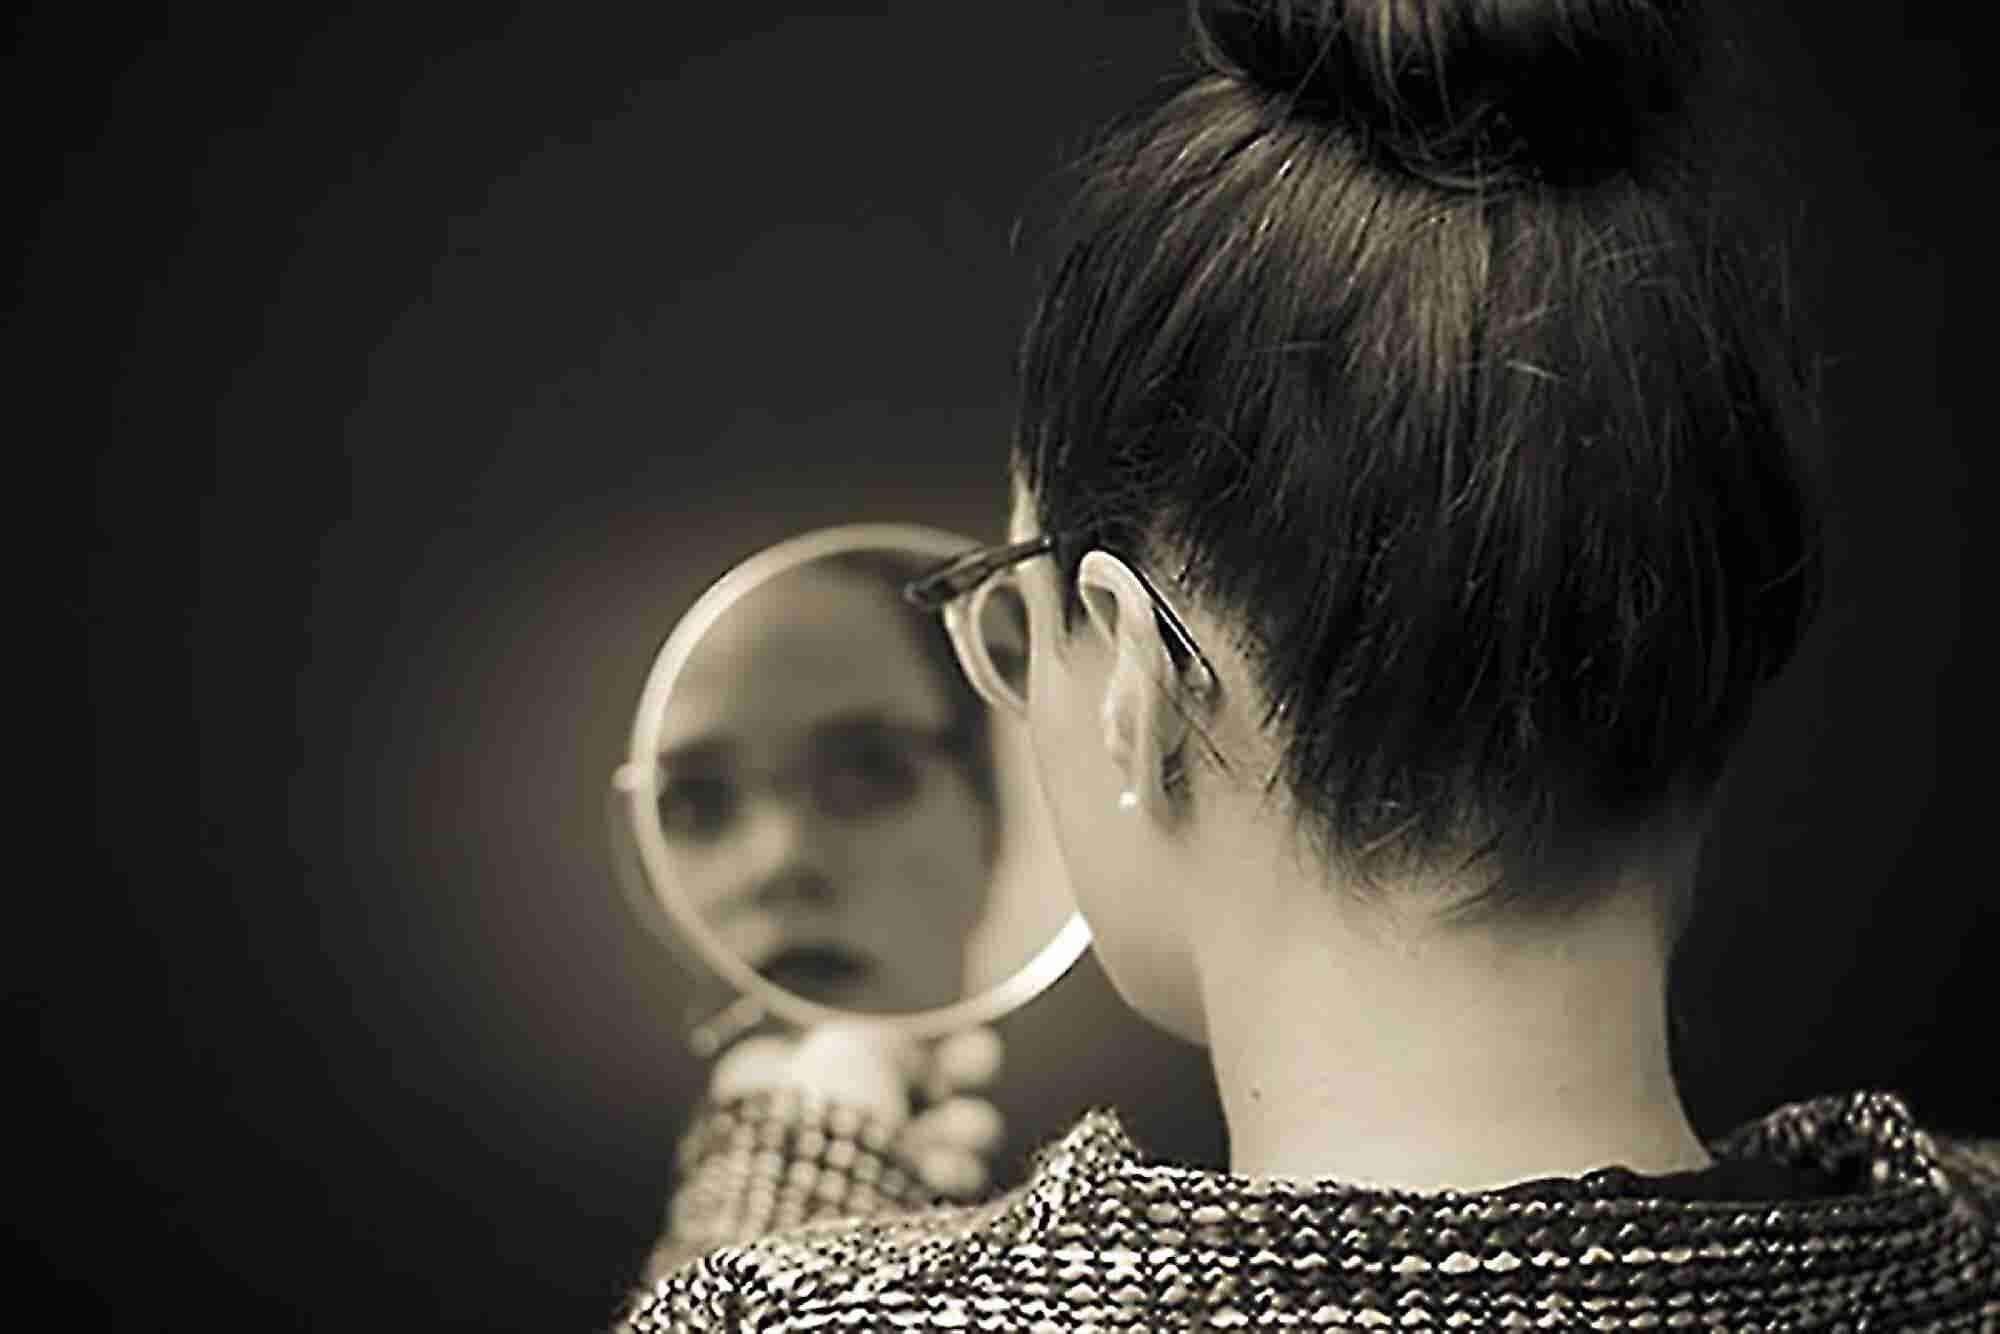 Beware of Pursuing ROE -- Return on Ego